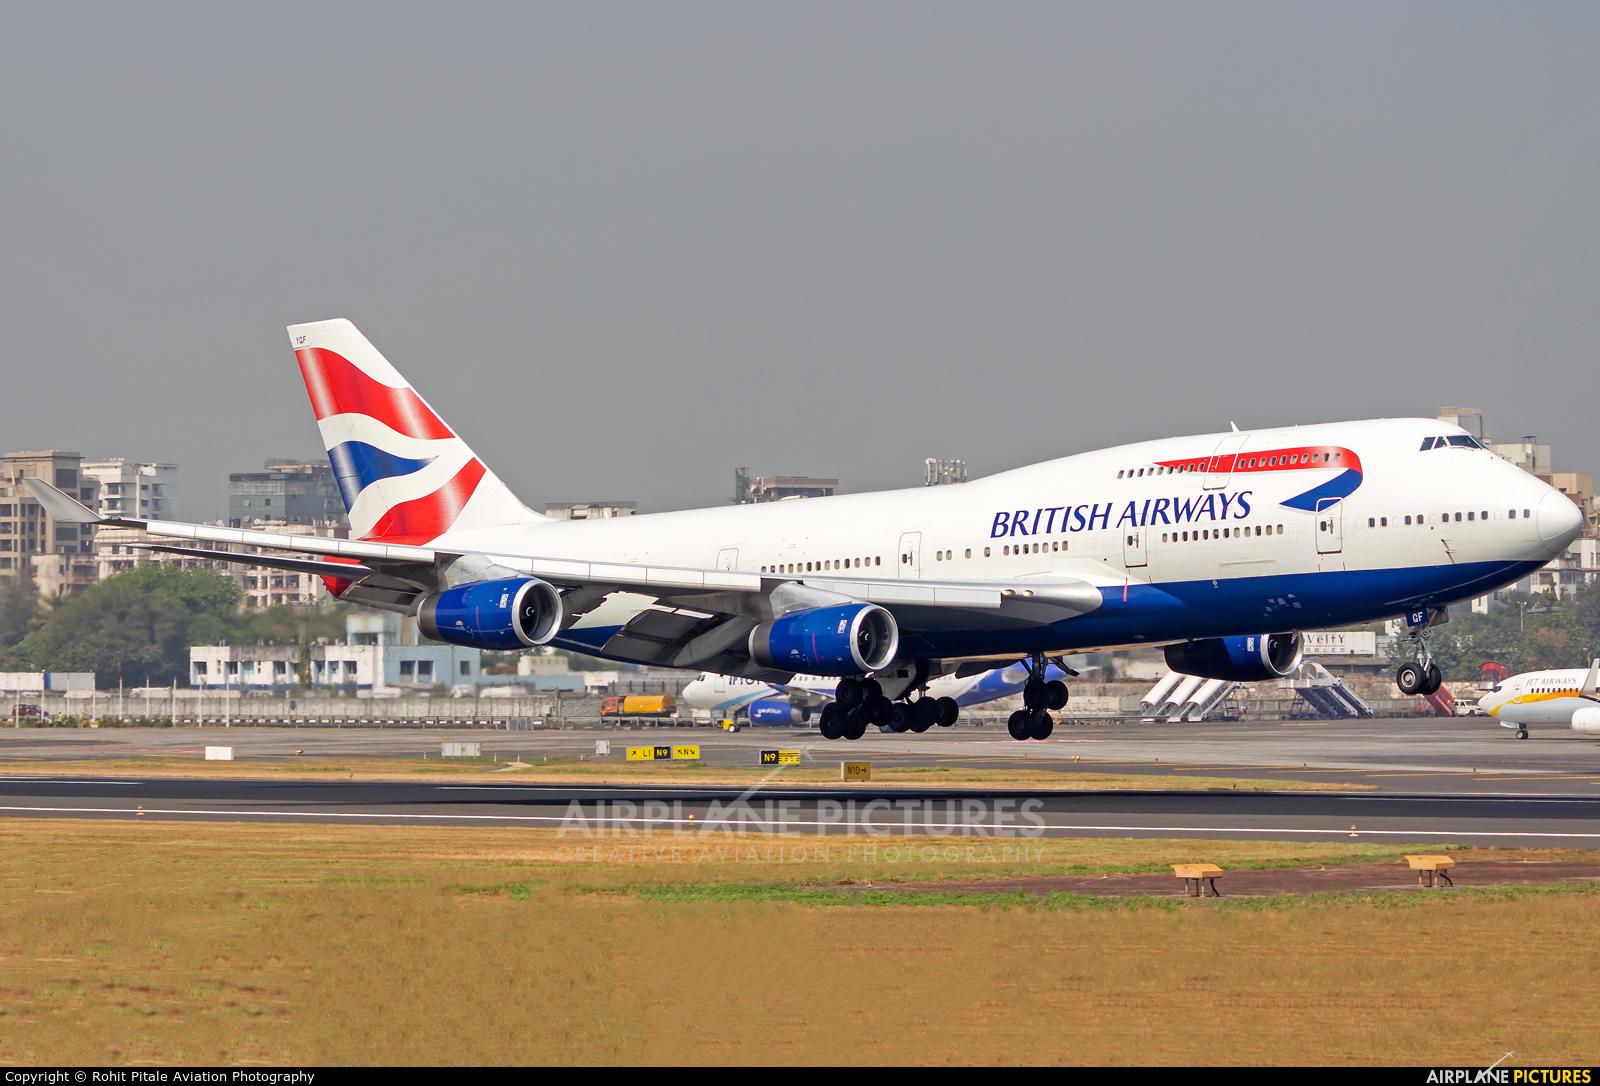 British Airways G-BYGF aircraft at Mumbai - Chhatrapati Shivaji Intl